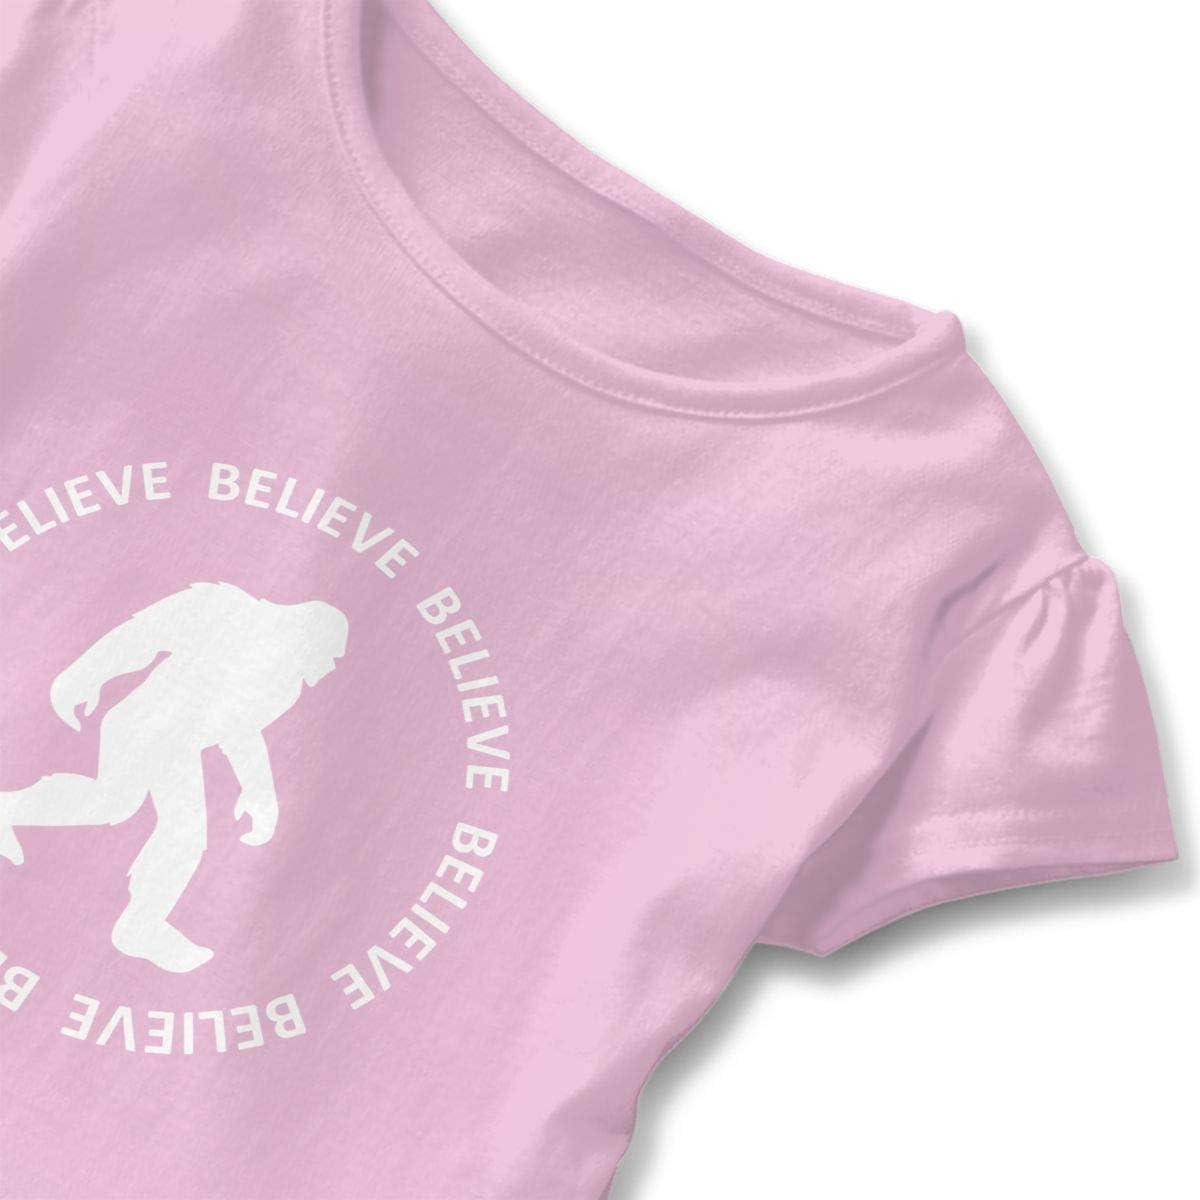 SDHEIJKY Toddler Girls Ruffle T-Shirt Bigfoot Sasquatch Believe Short Sleeve 2-6T